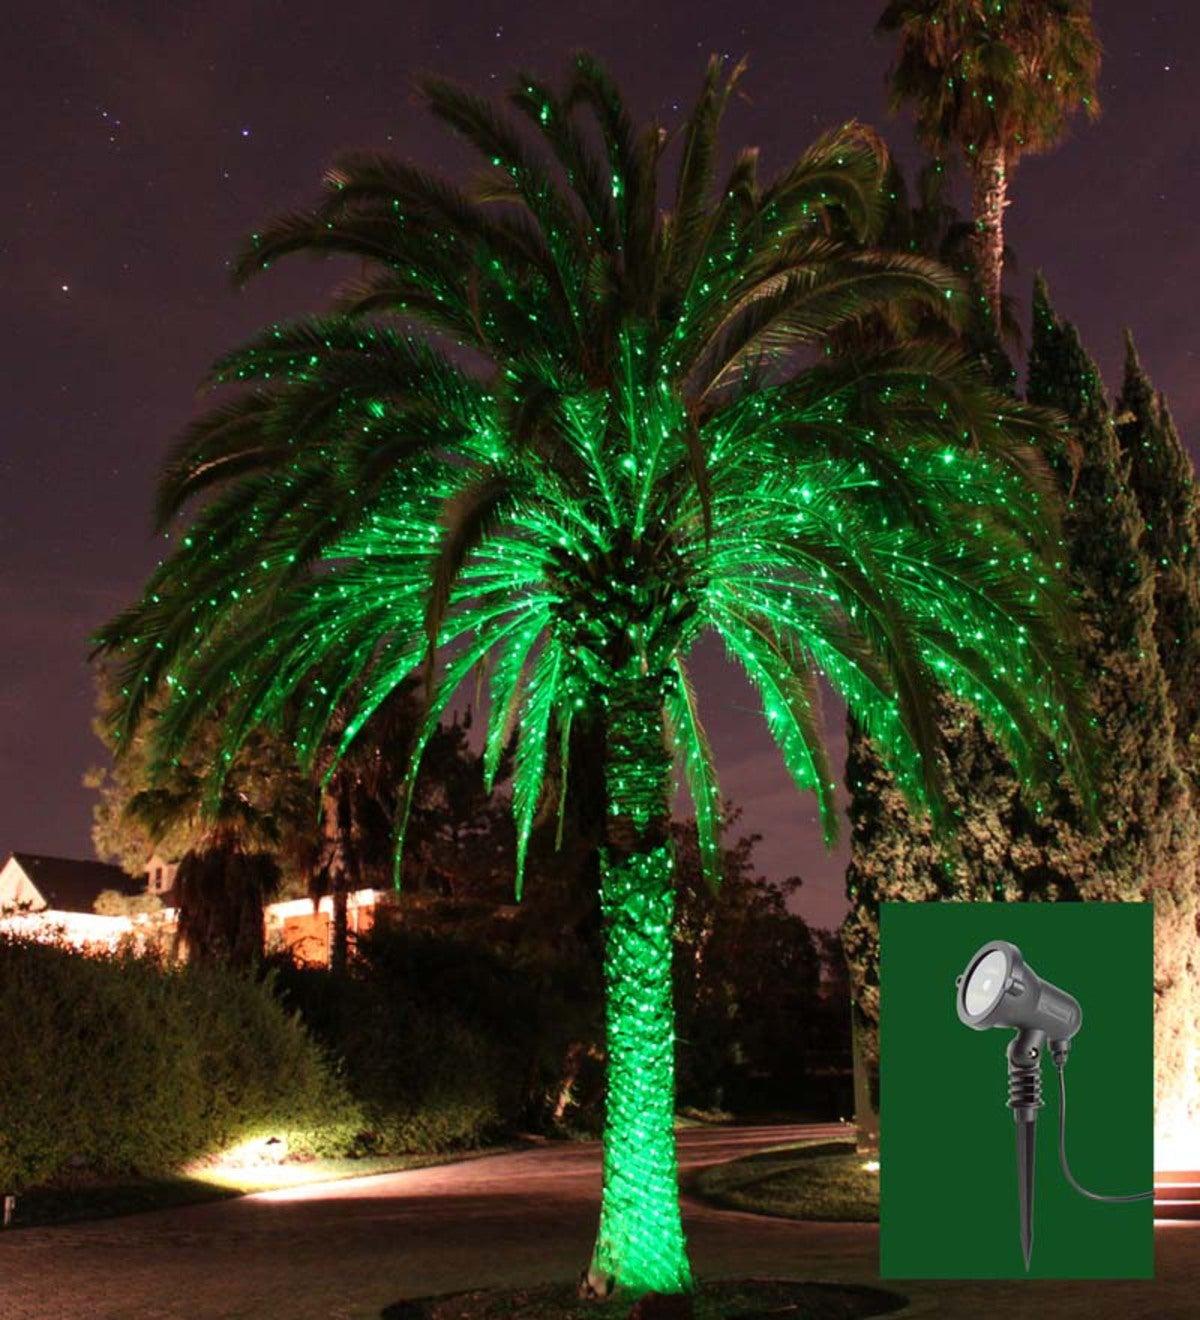 Usa Made Firefly Decorative Landscape Lighting Green